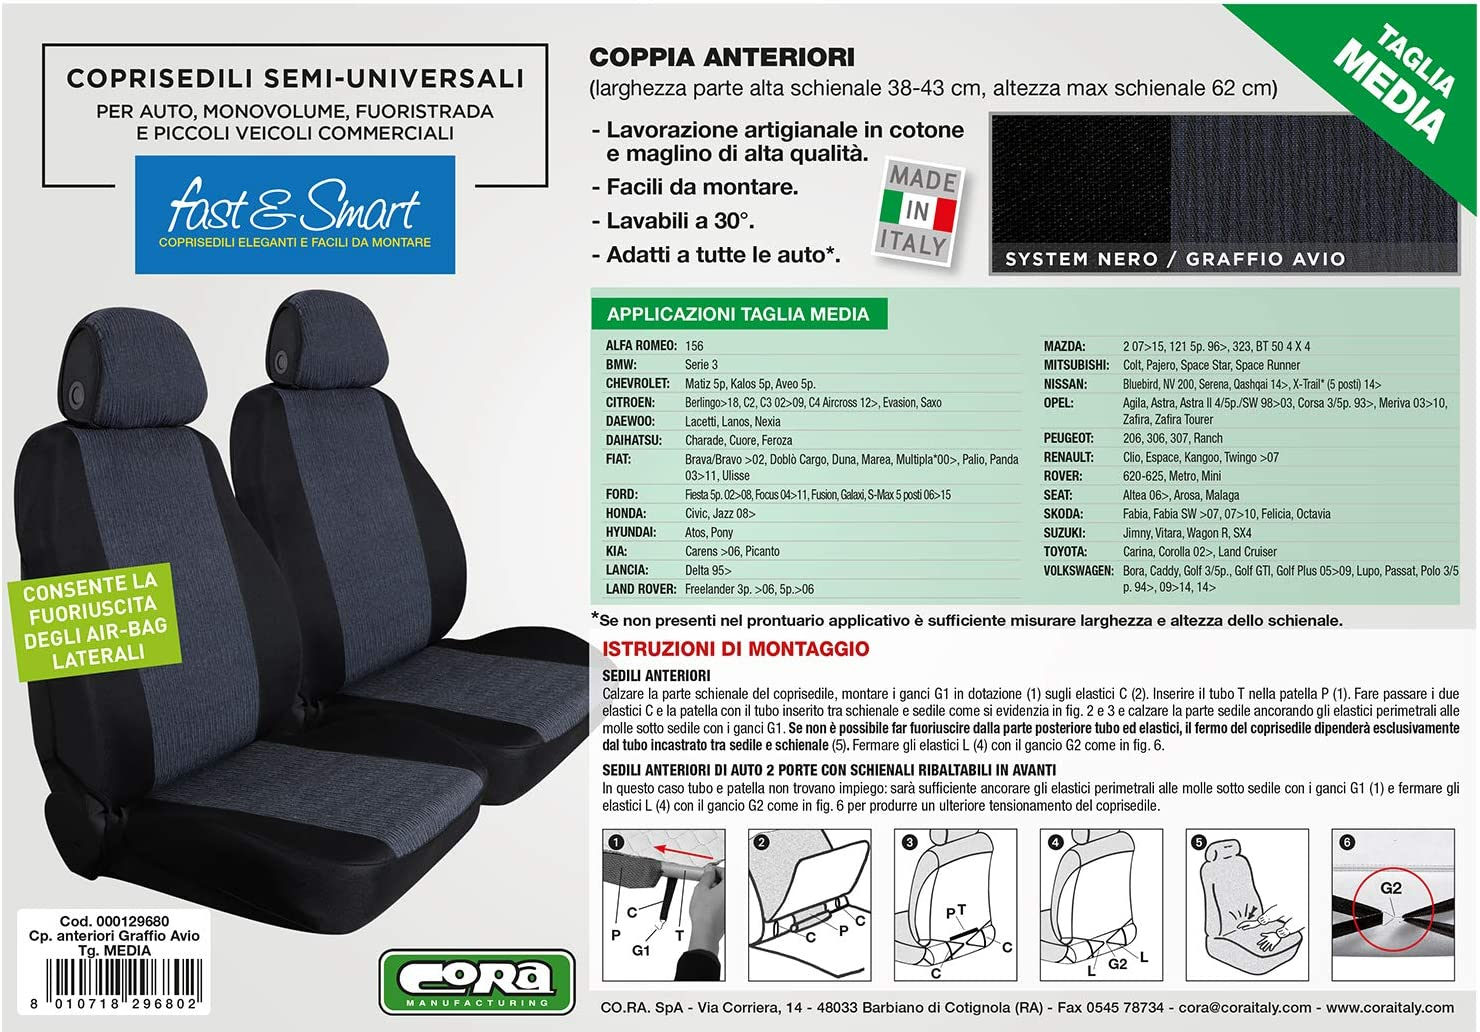 Cora 000129680 Front Seat Covers Fast/&Smart Size Medium Tess Graffio Avio